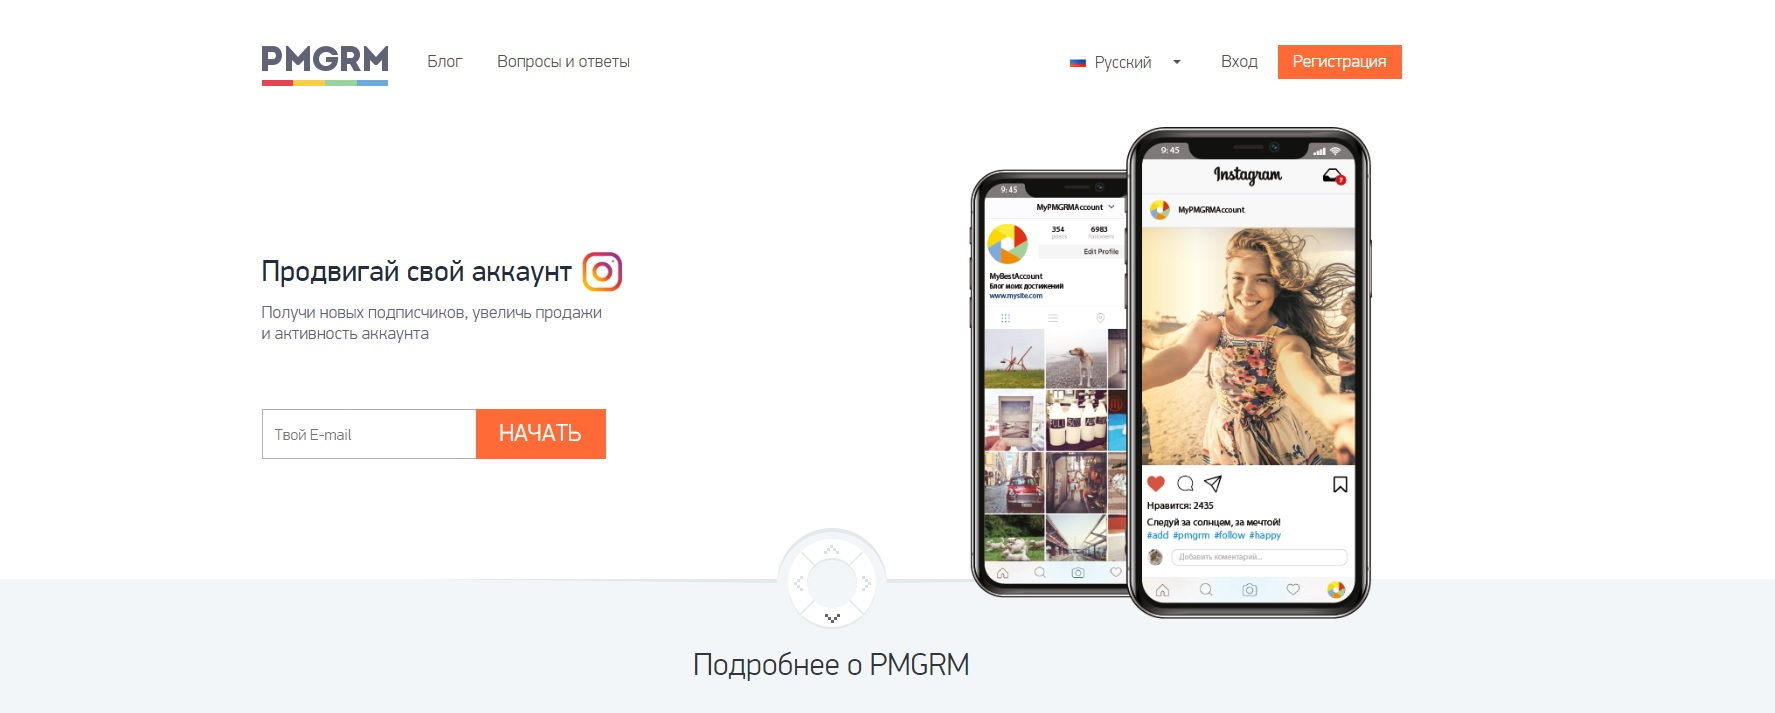 Раскрутка аккаунта в инстаграм через смартфон